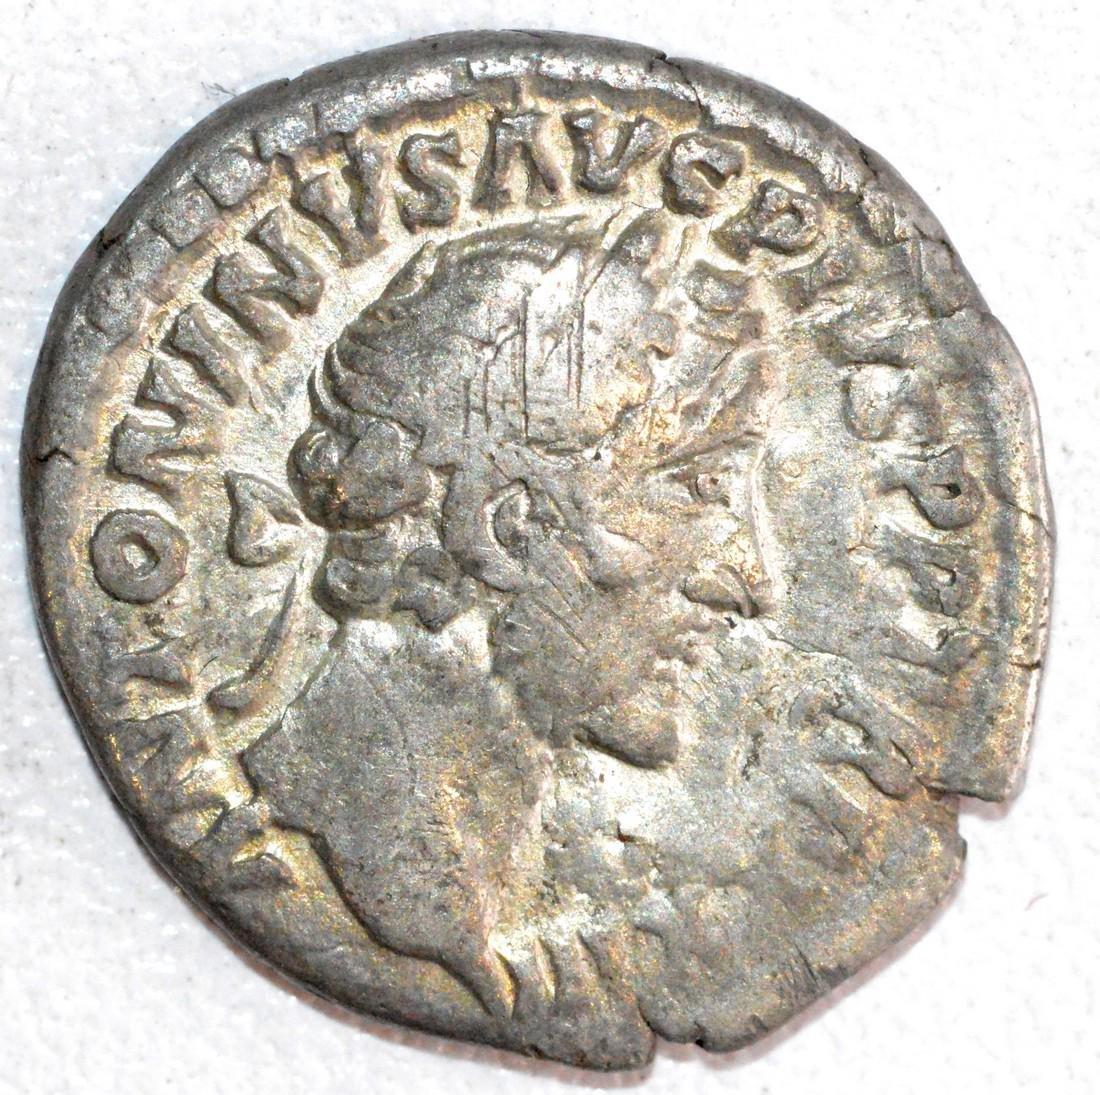 Ancient Roman Silver Denarius of Emperor Antoninus Pius